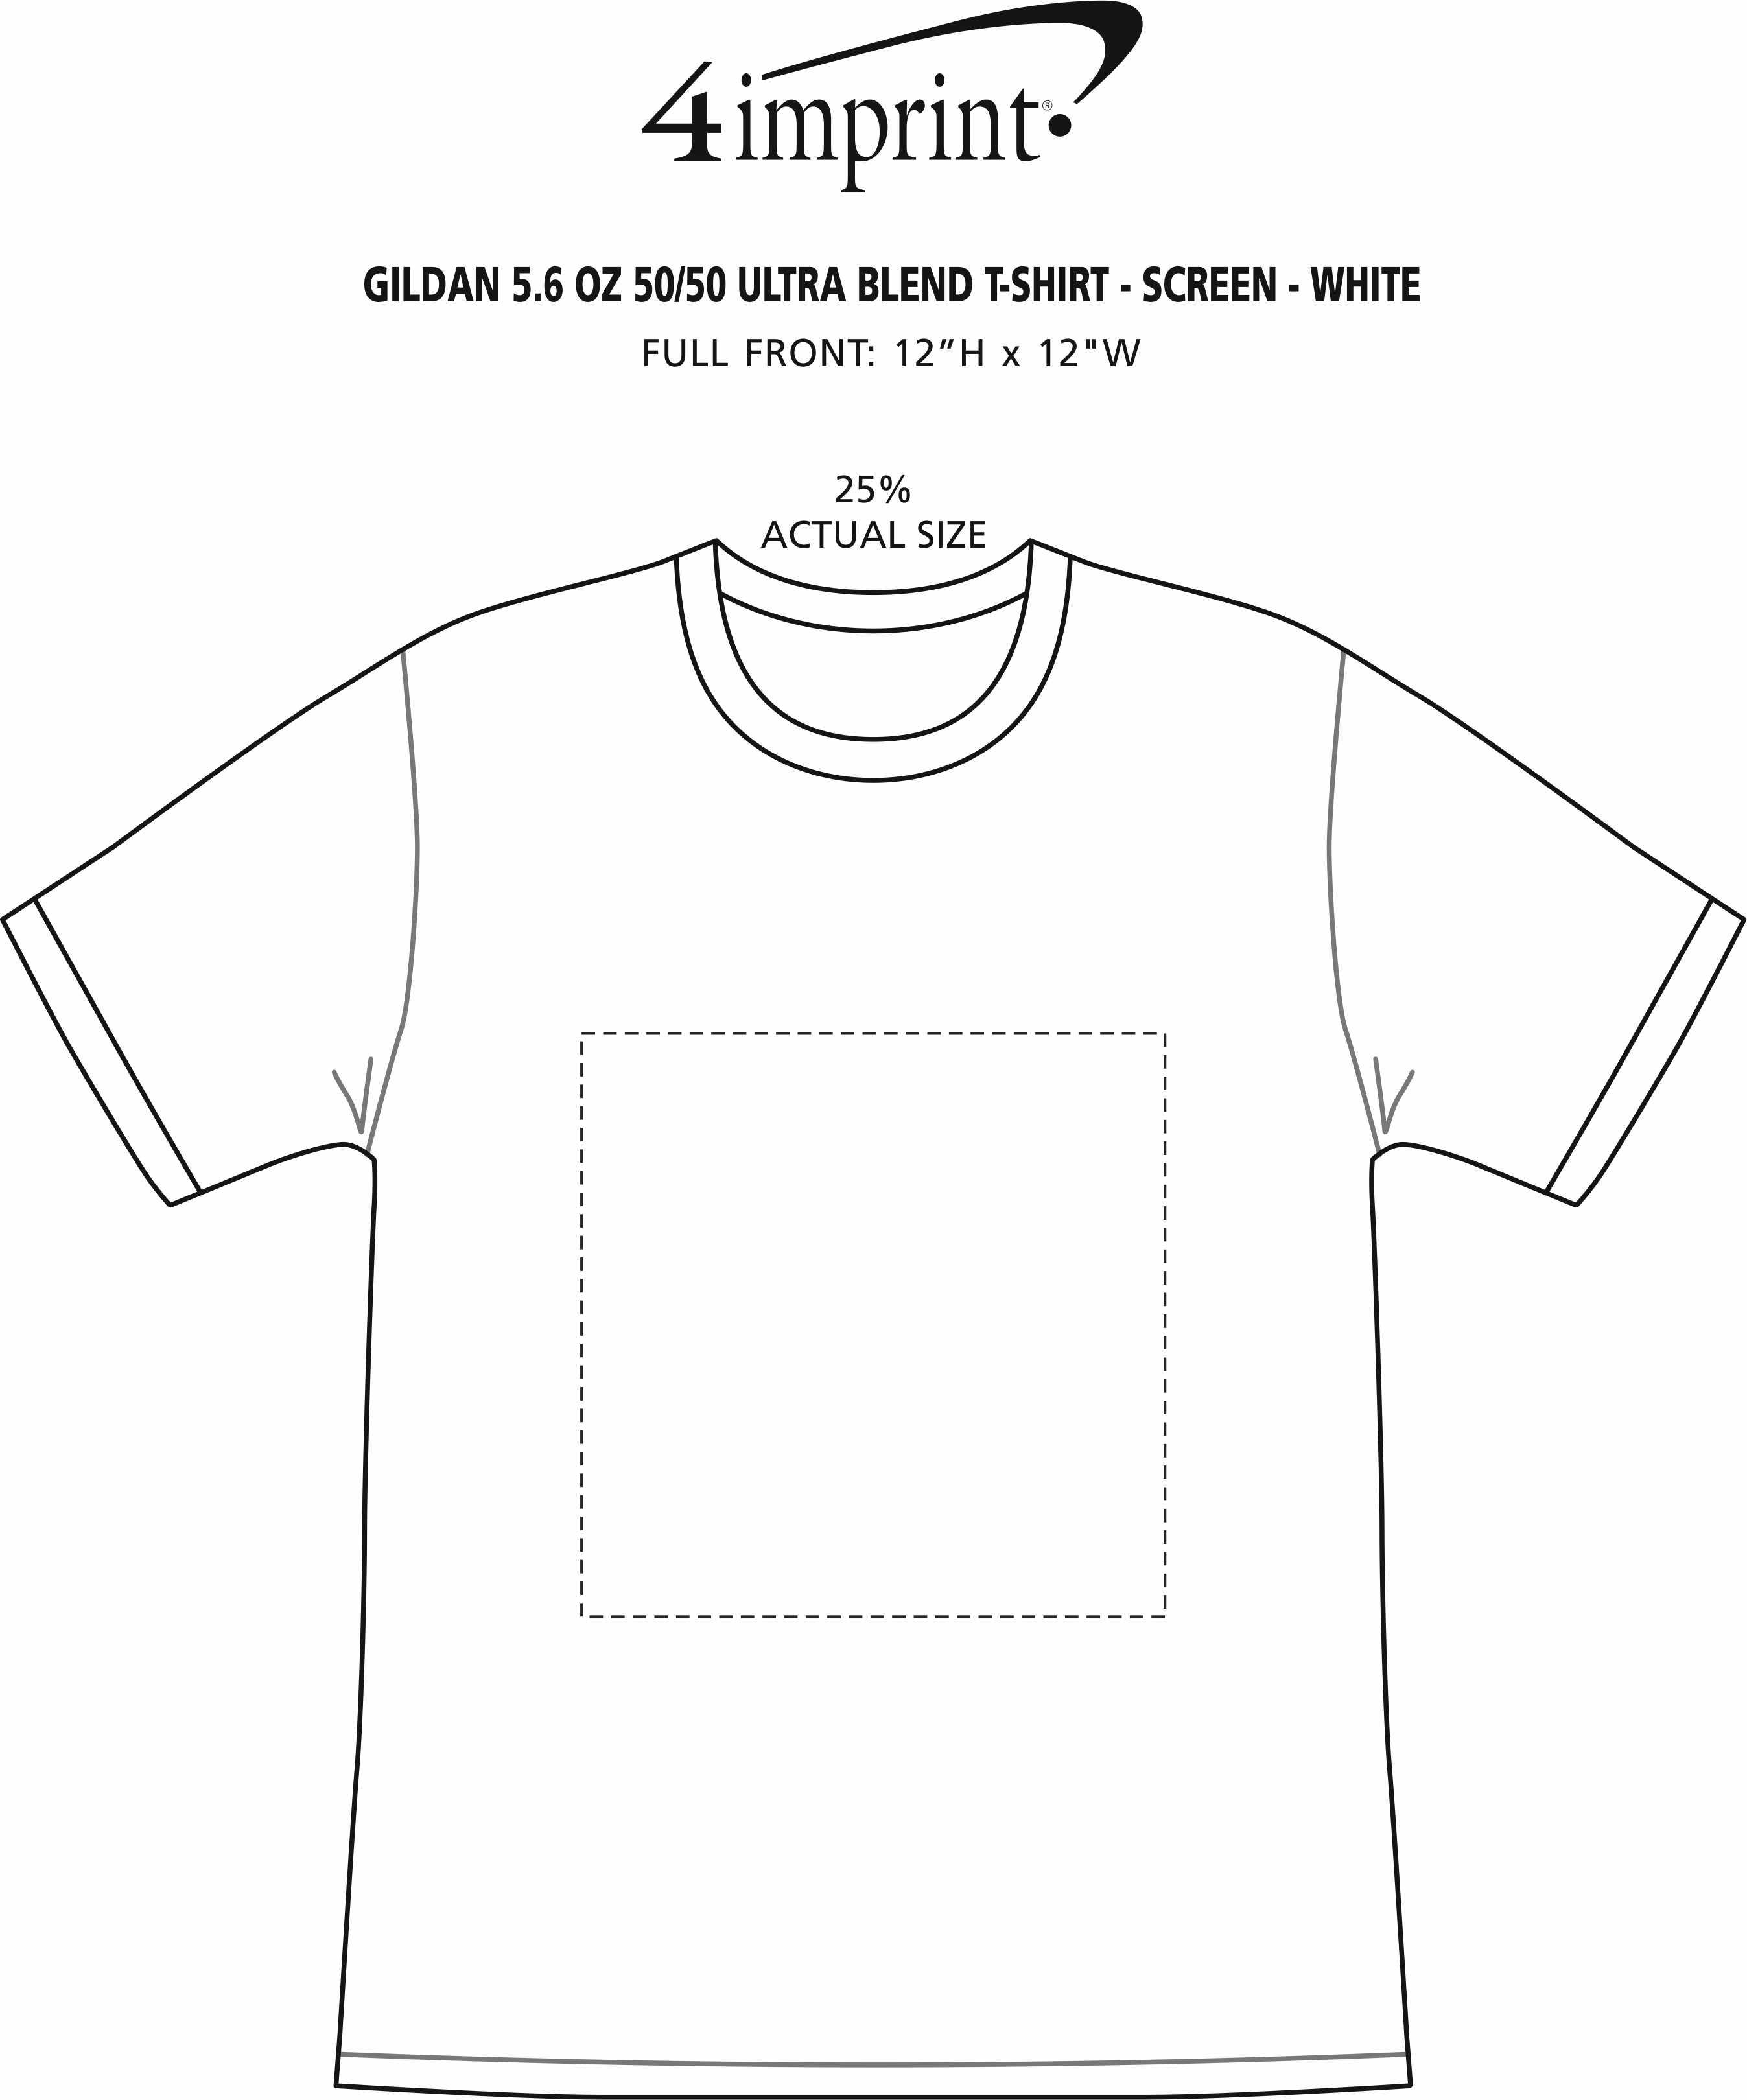 Imprint Area of Gildan 5.5 oz. DryBlend 50/50 T-Shirt - Screen - White